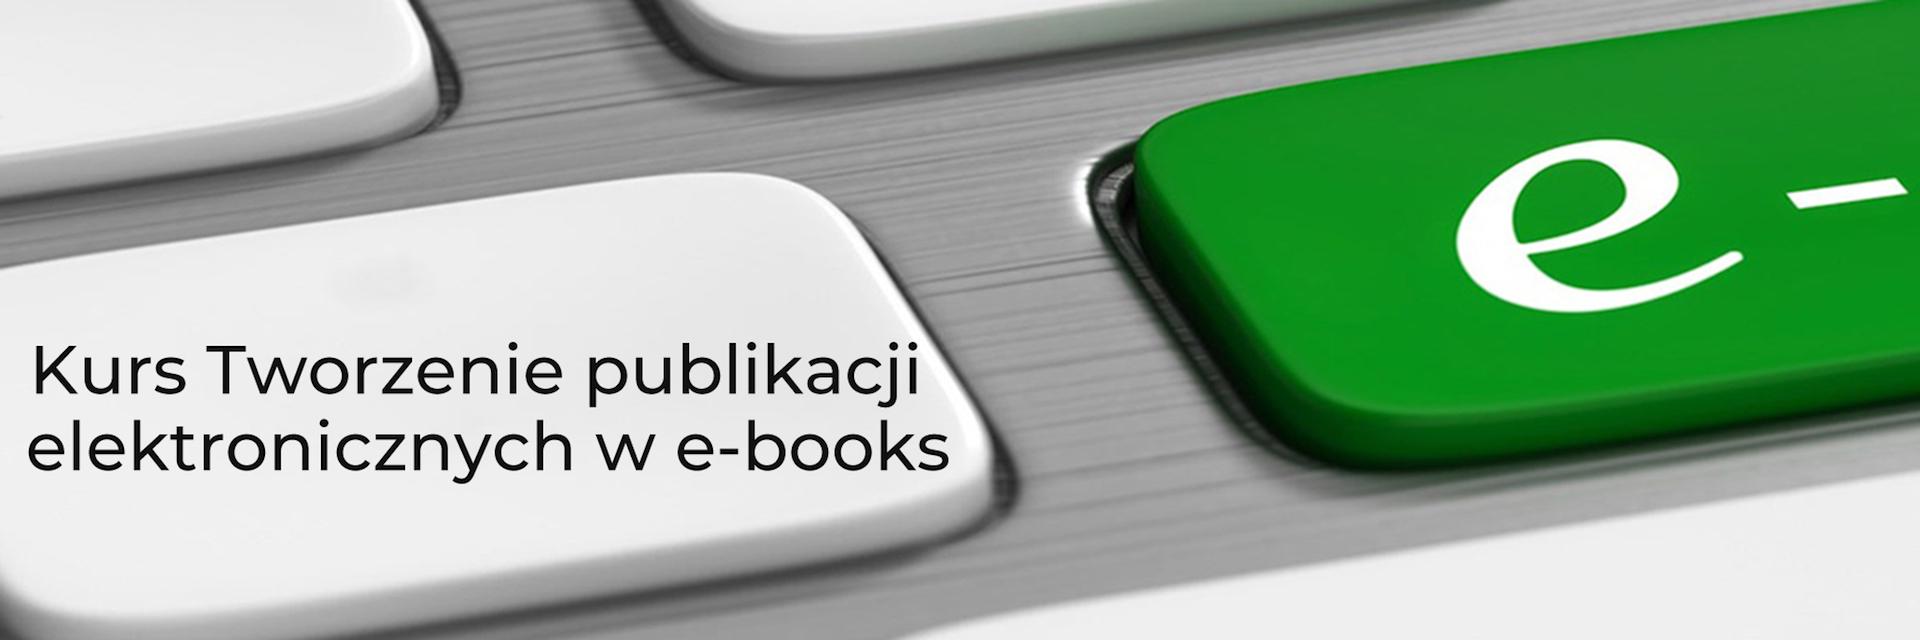 Kurs e-publikacji